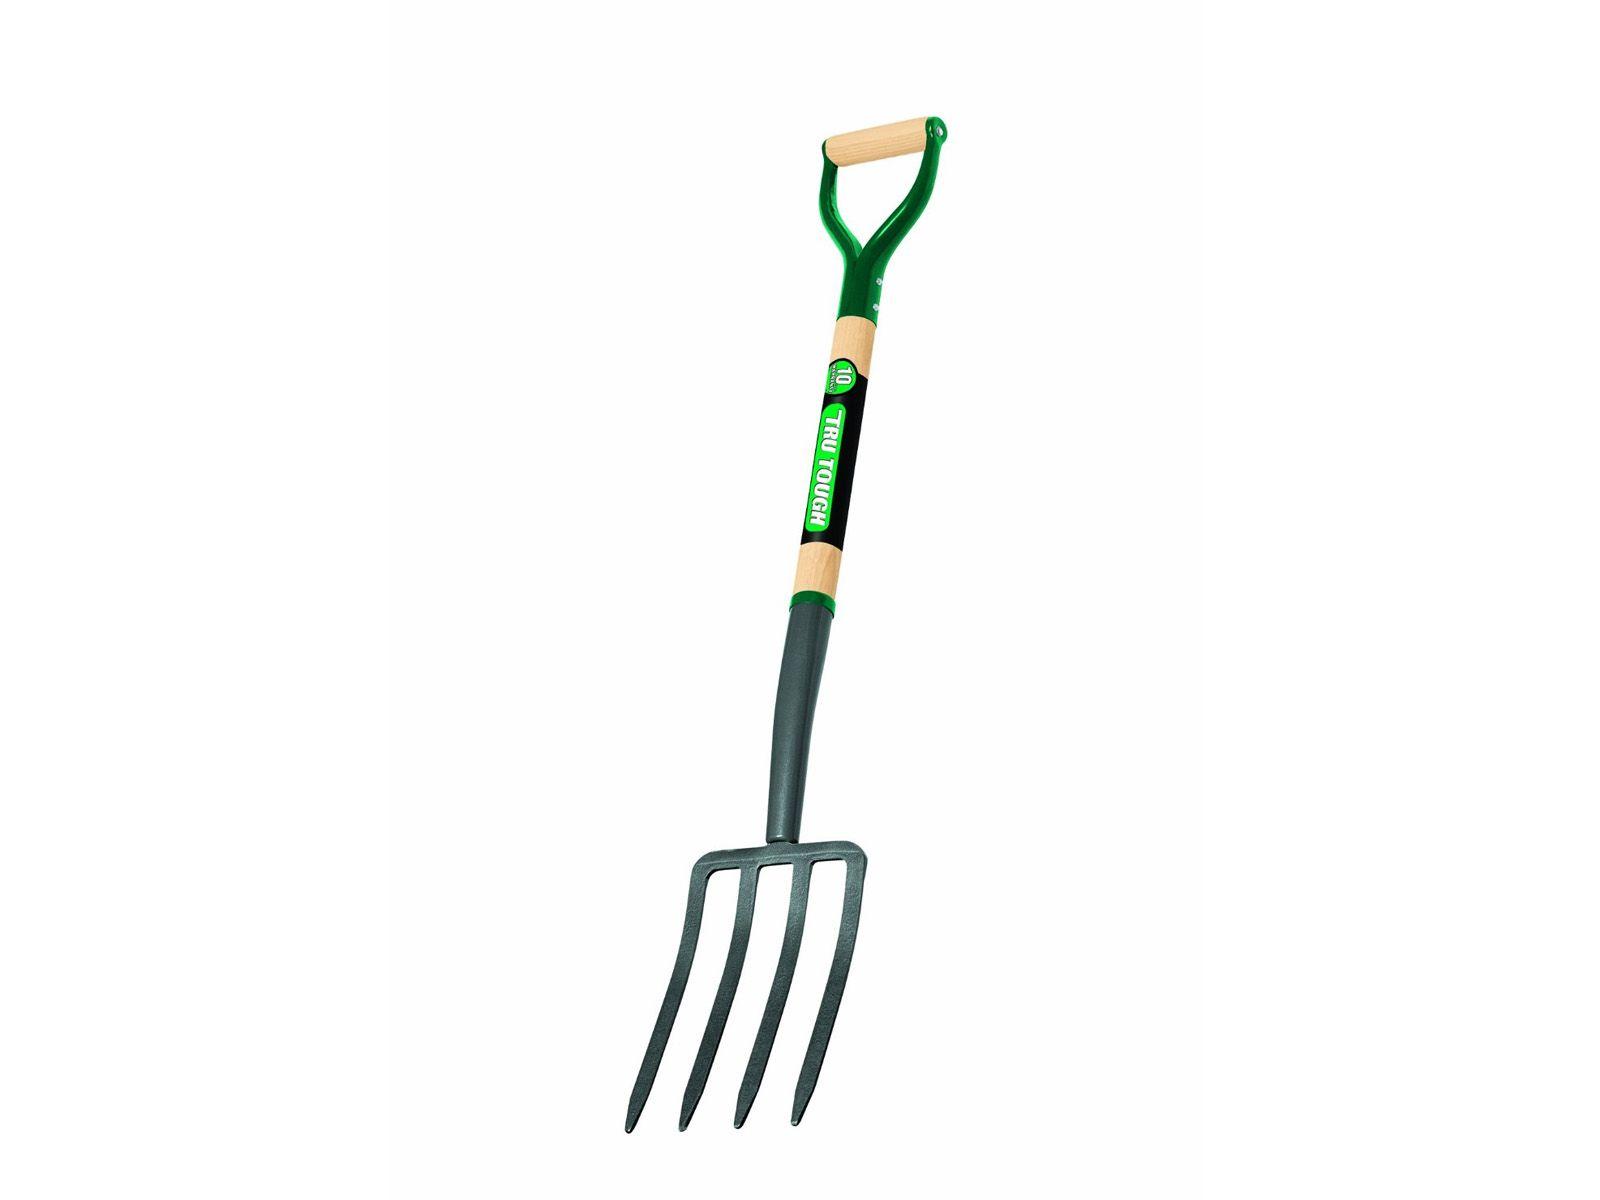 Tru Toough Spding Fork